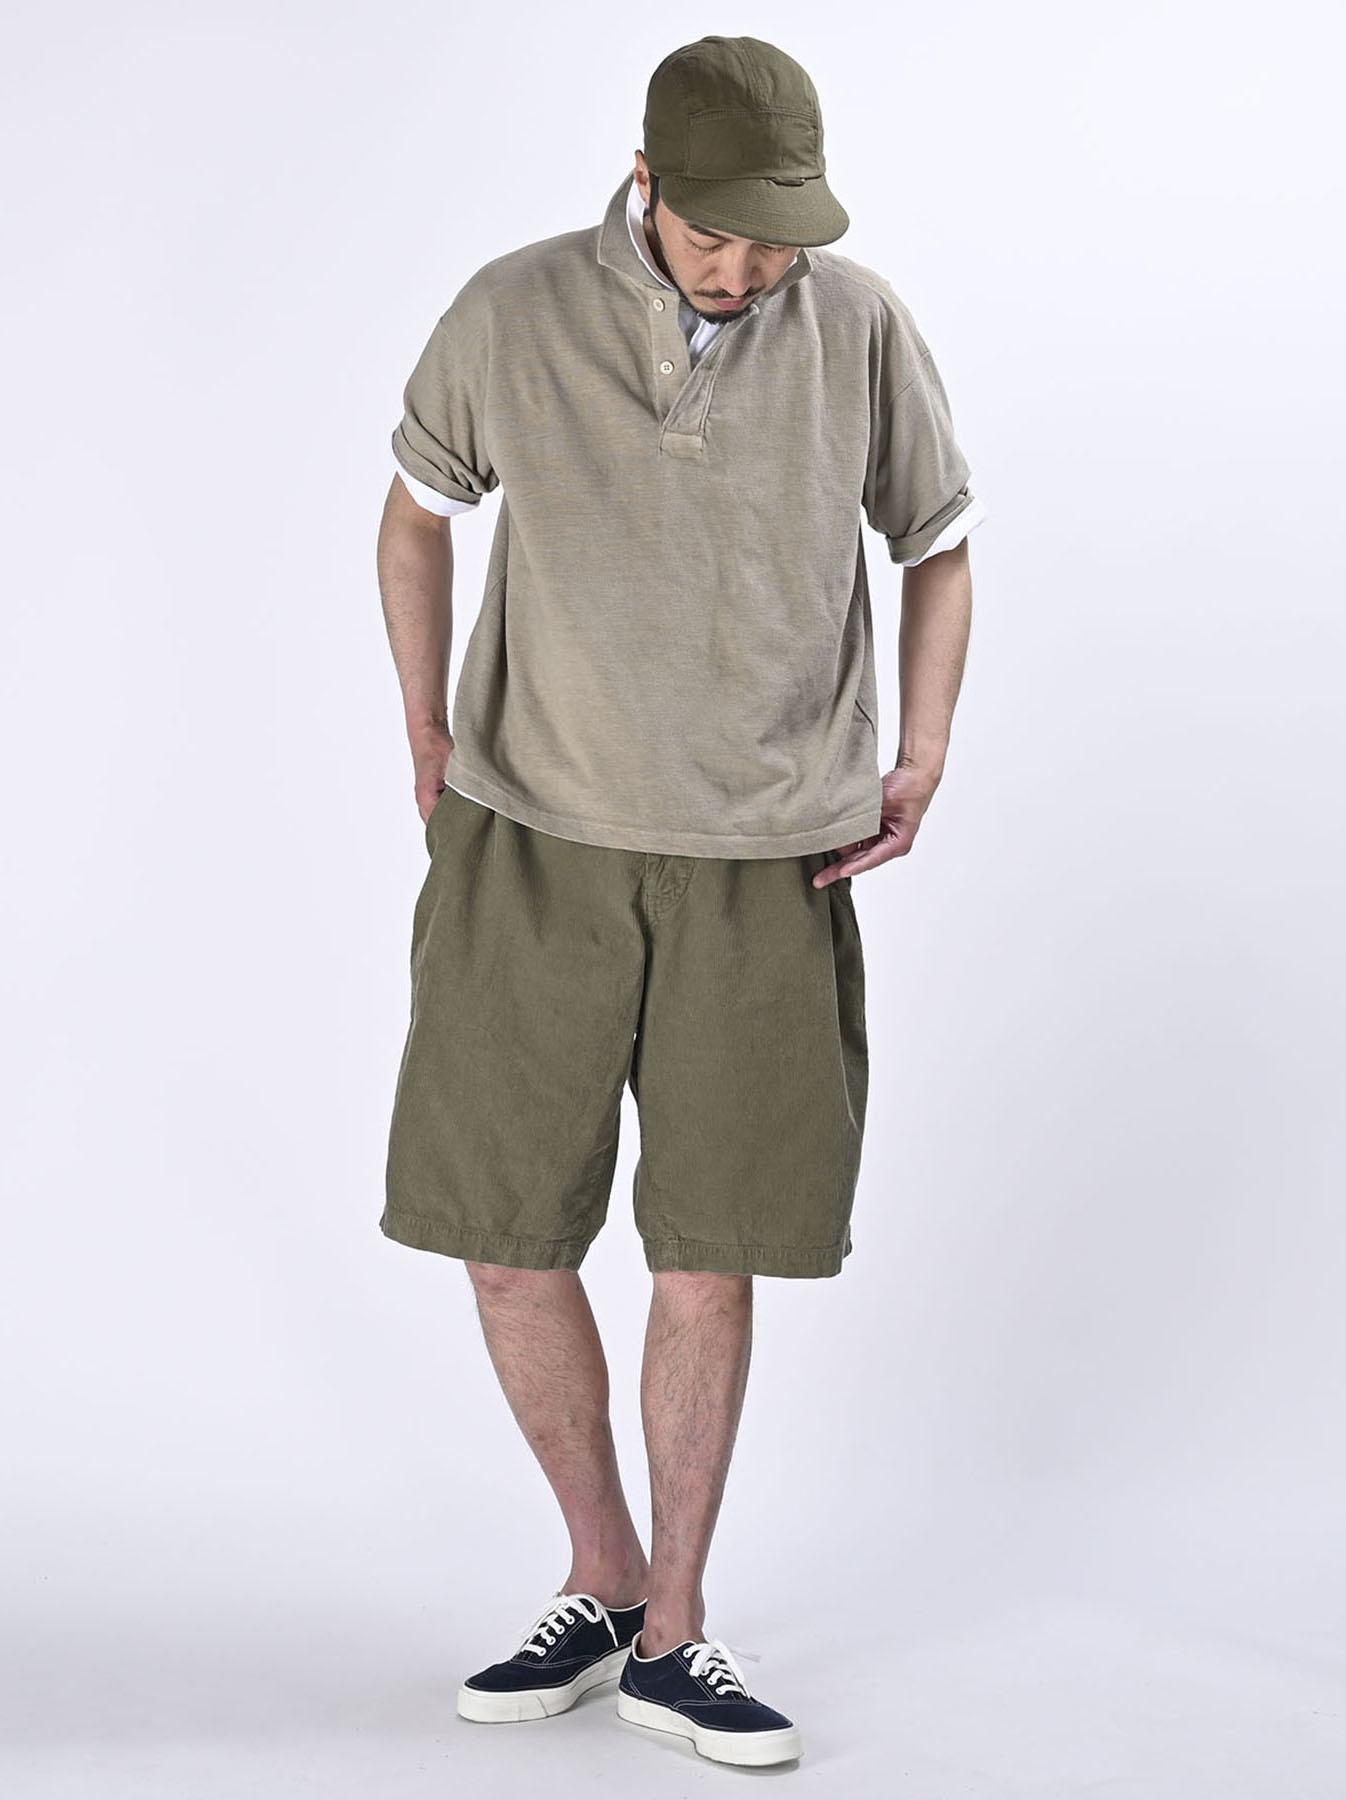 Kanoko Ocean Shiokaze Short-sleeved Polo Shirt (0521)-8